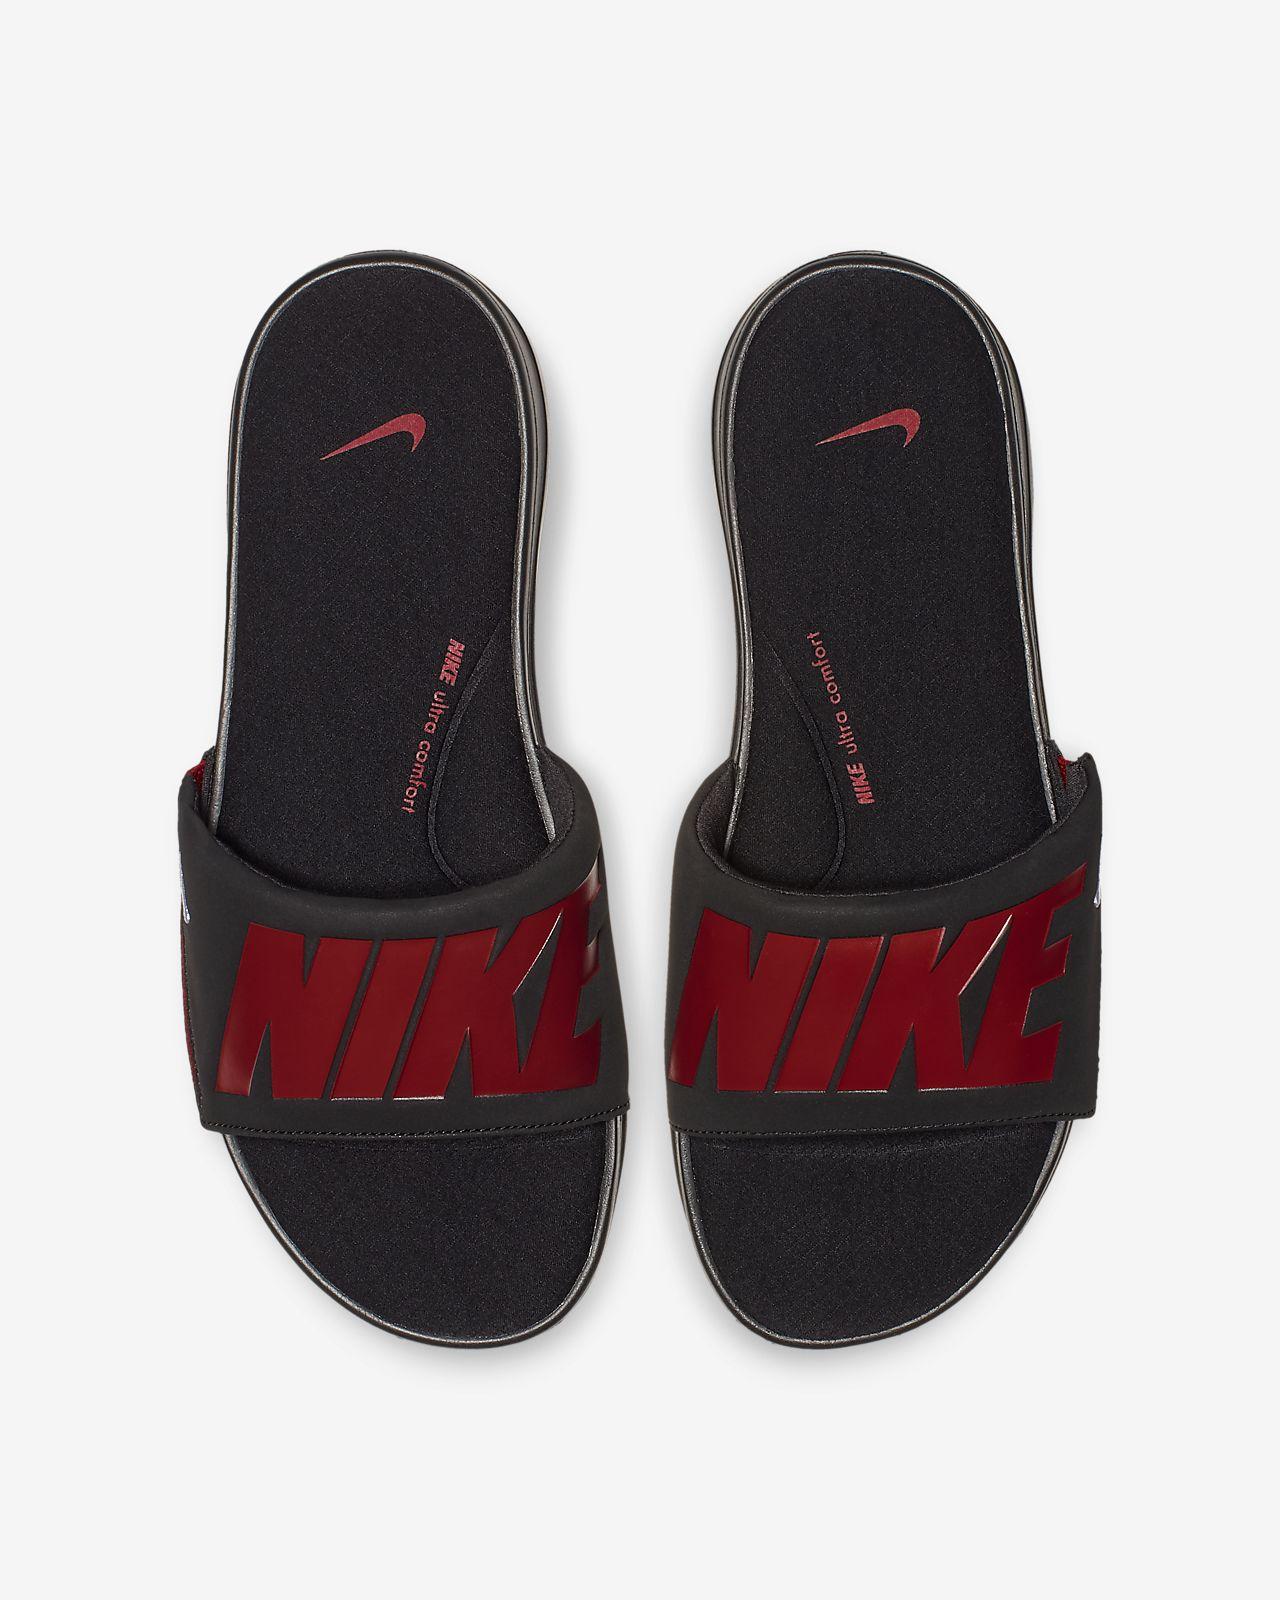 920847fb31b75 Nike Ultra Comfort 3 Men s Slide. Nike.com